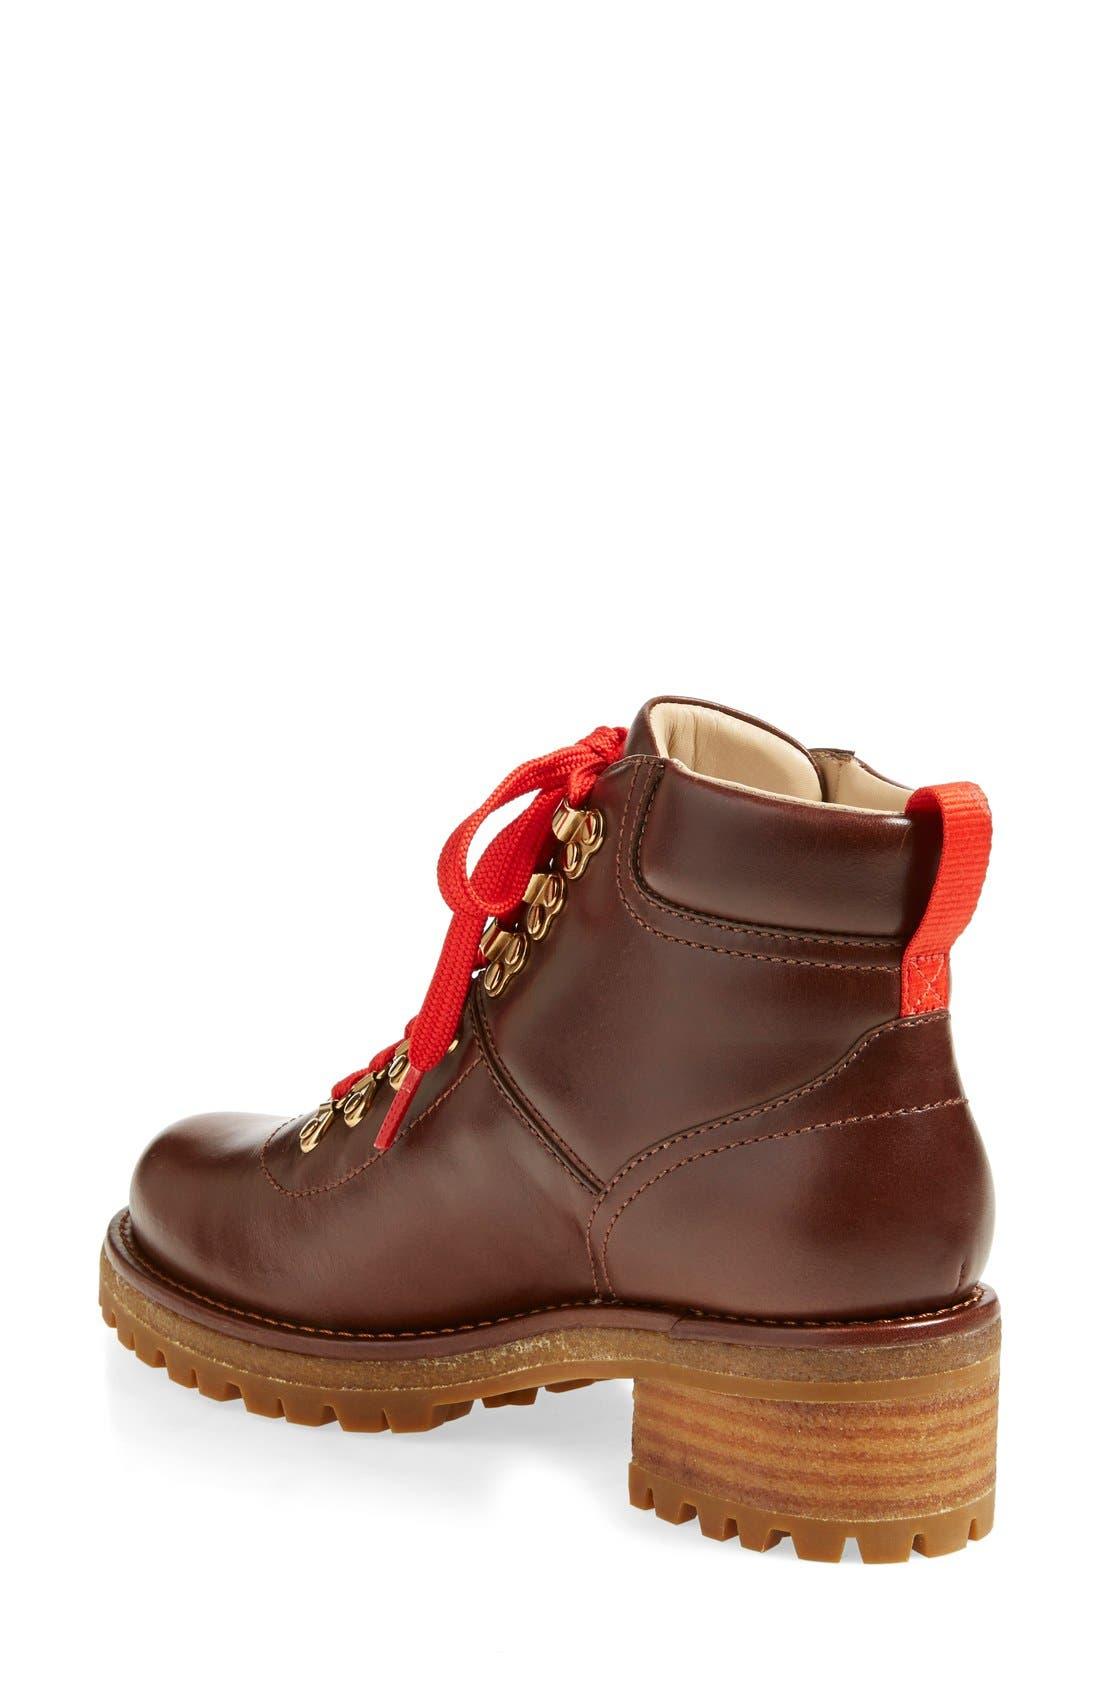 'Gunton' Ankle Hiking Boot,                             Alternate thumbnail 3, color,                             200